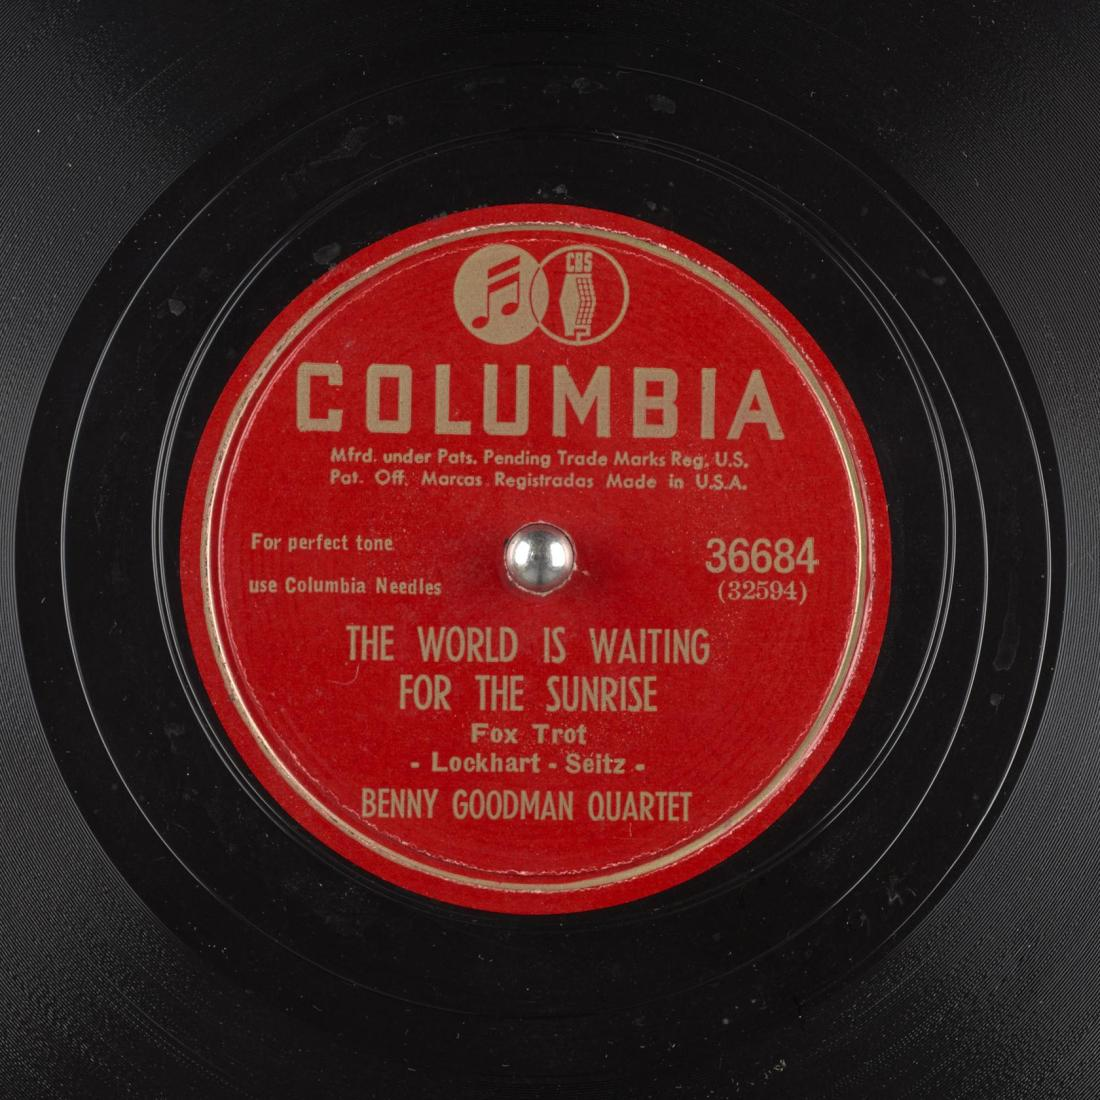 78_the-world-is-waiting-for-the-sunrise_benny-goodman-quartet-seitz-lockhart_gbia0001140b_itemimage